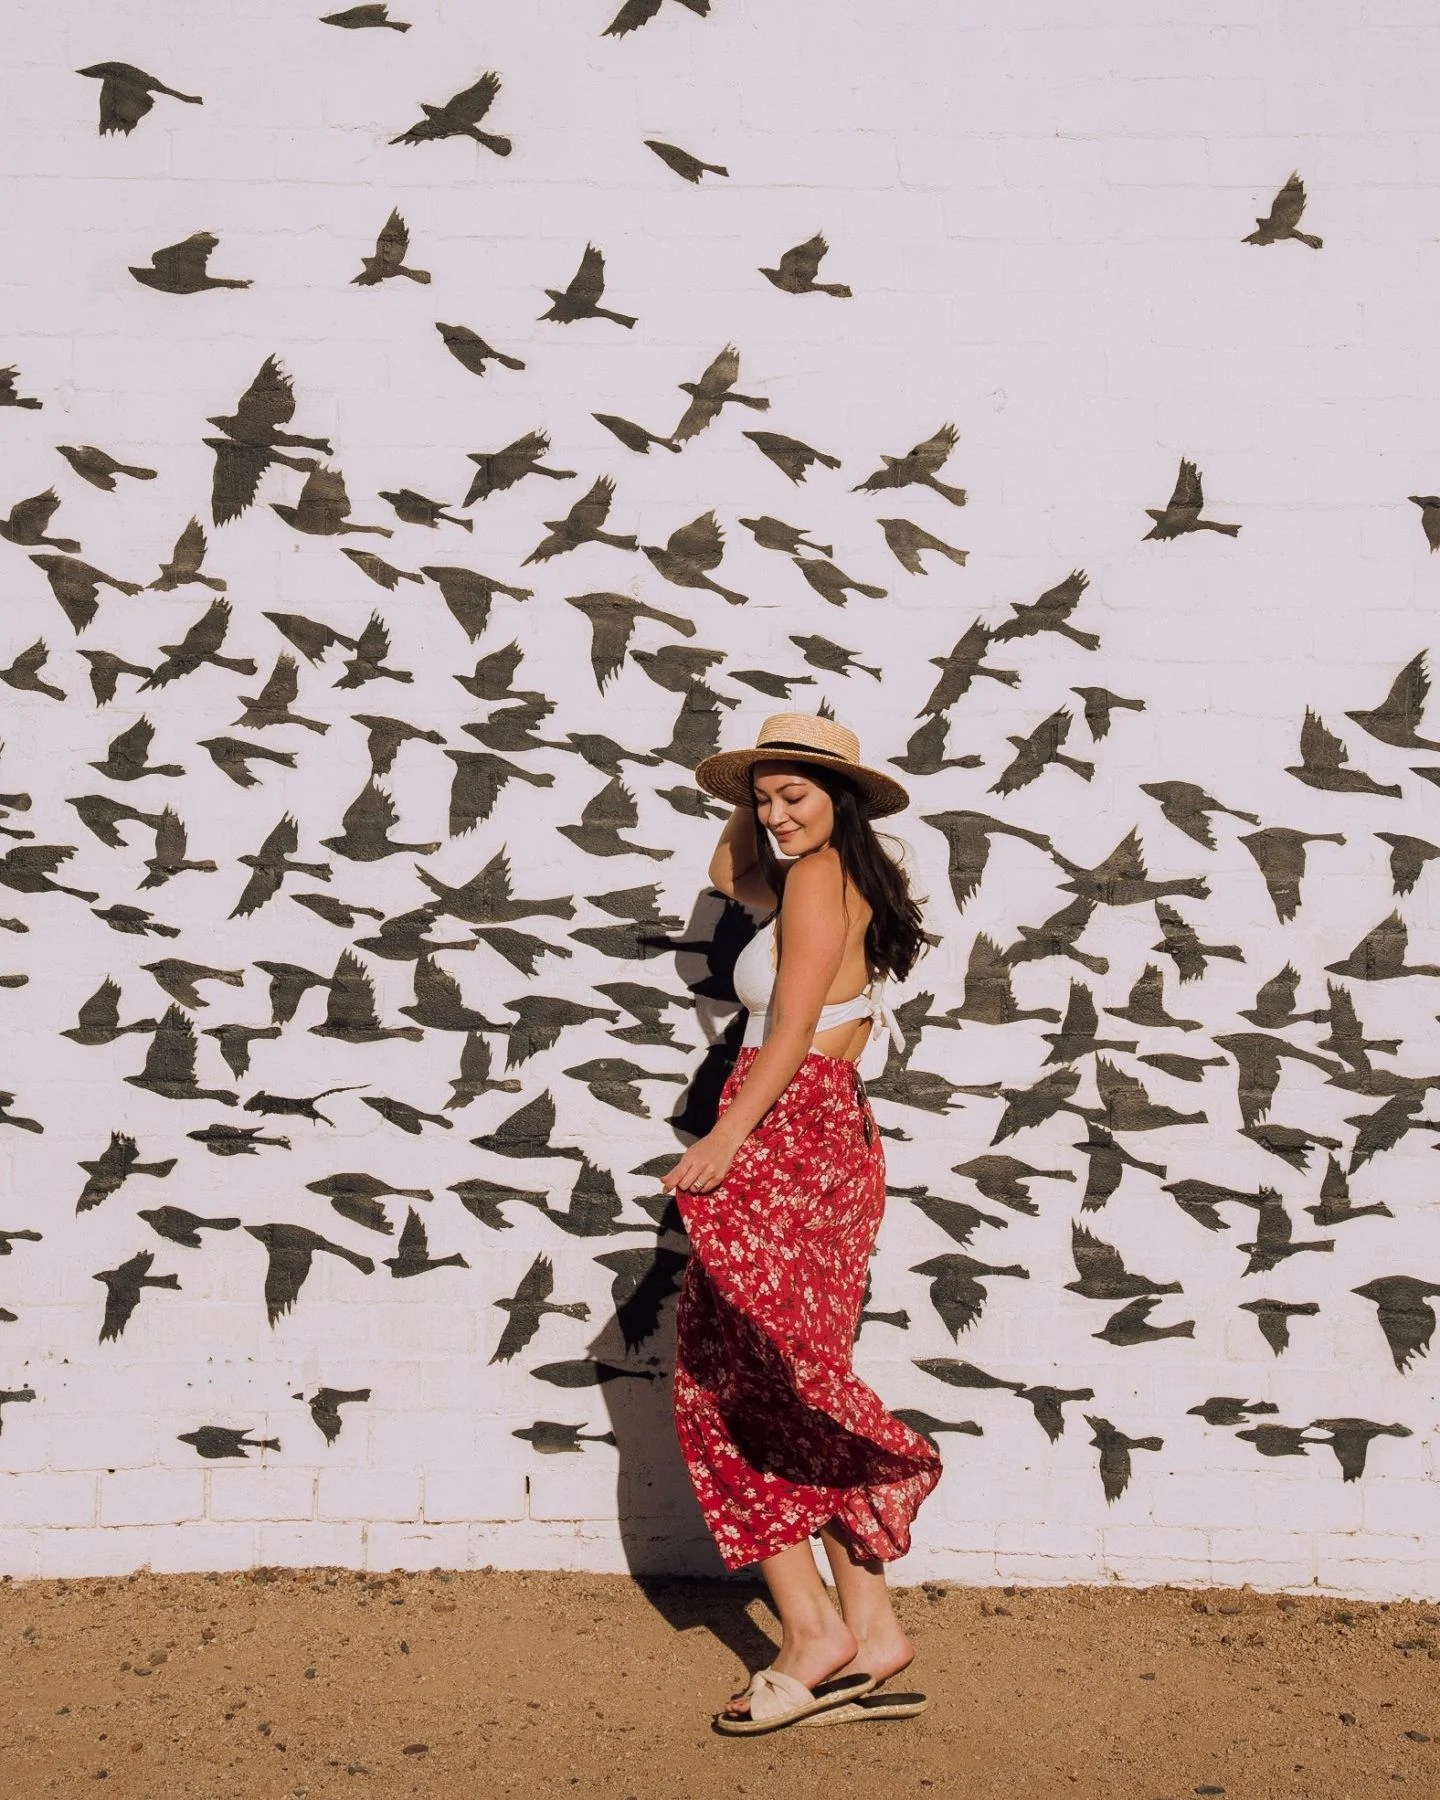 birds mural in phoenix az